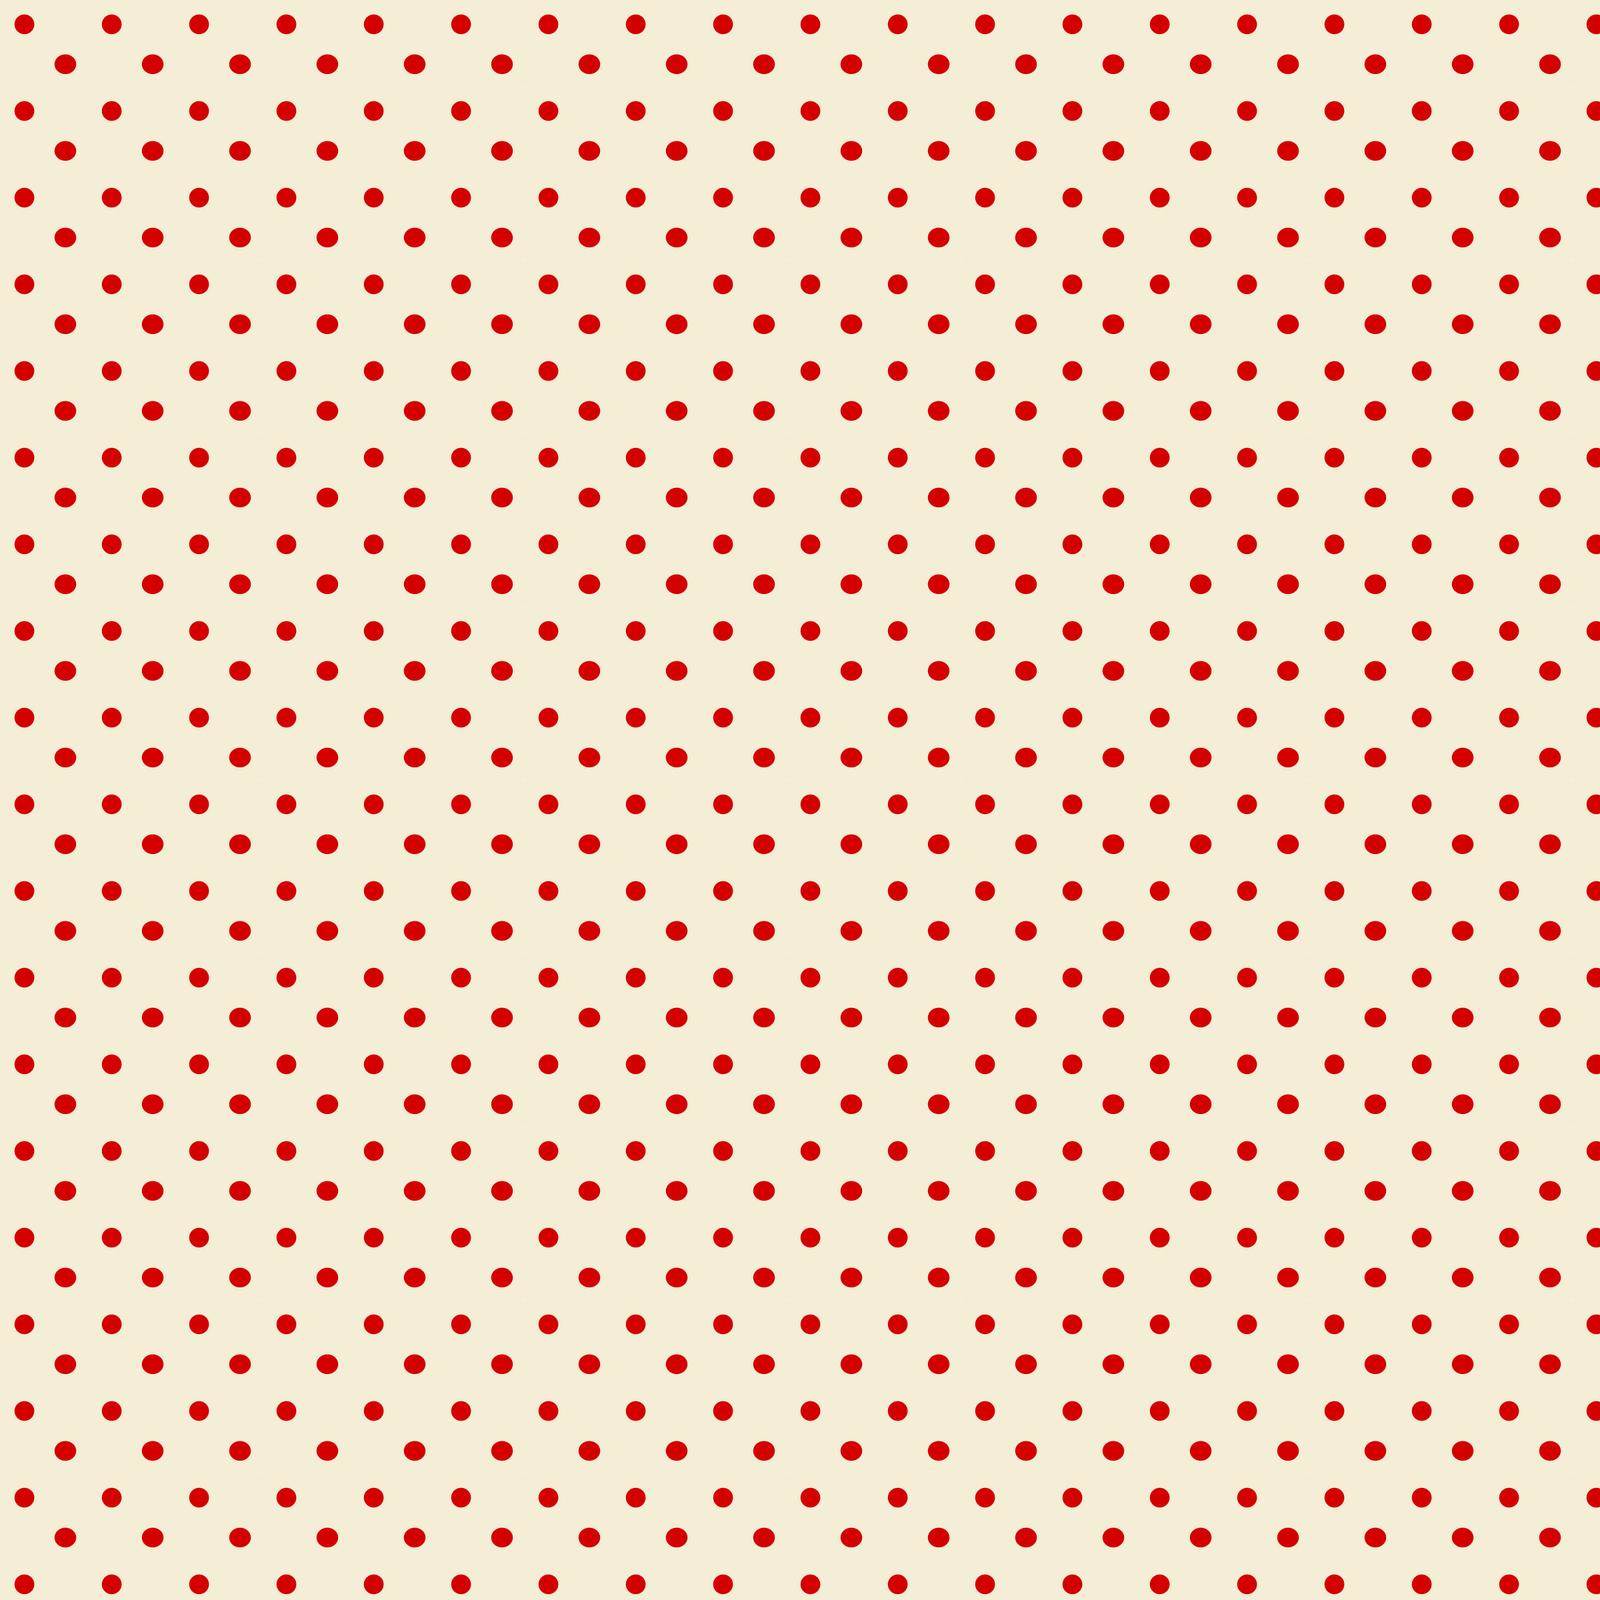 free polka dot scrapbook paper – free printable wrapping paper